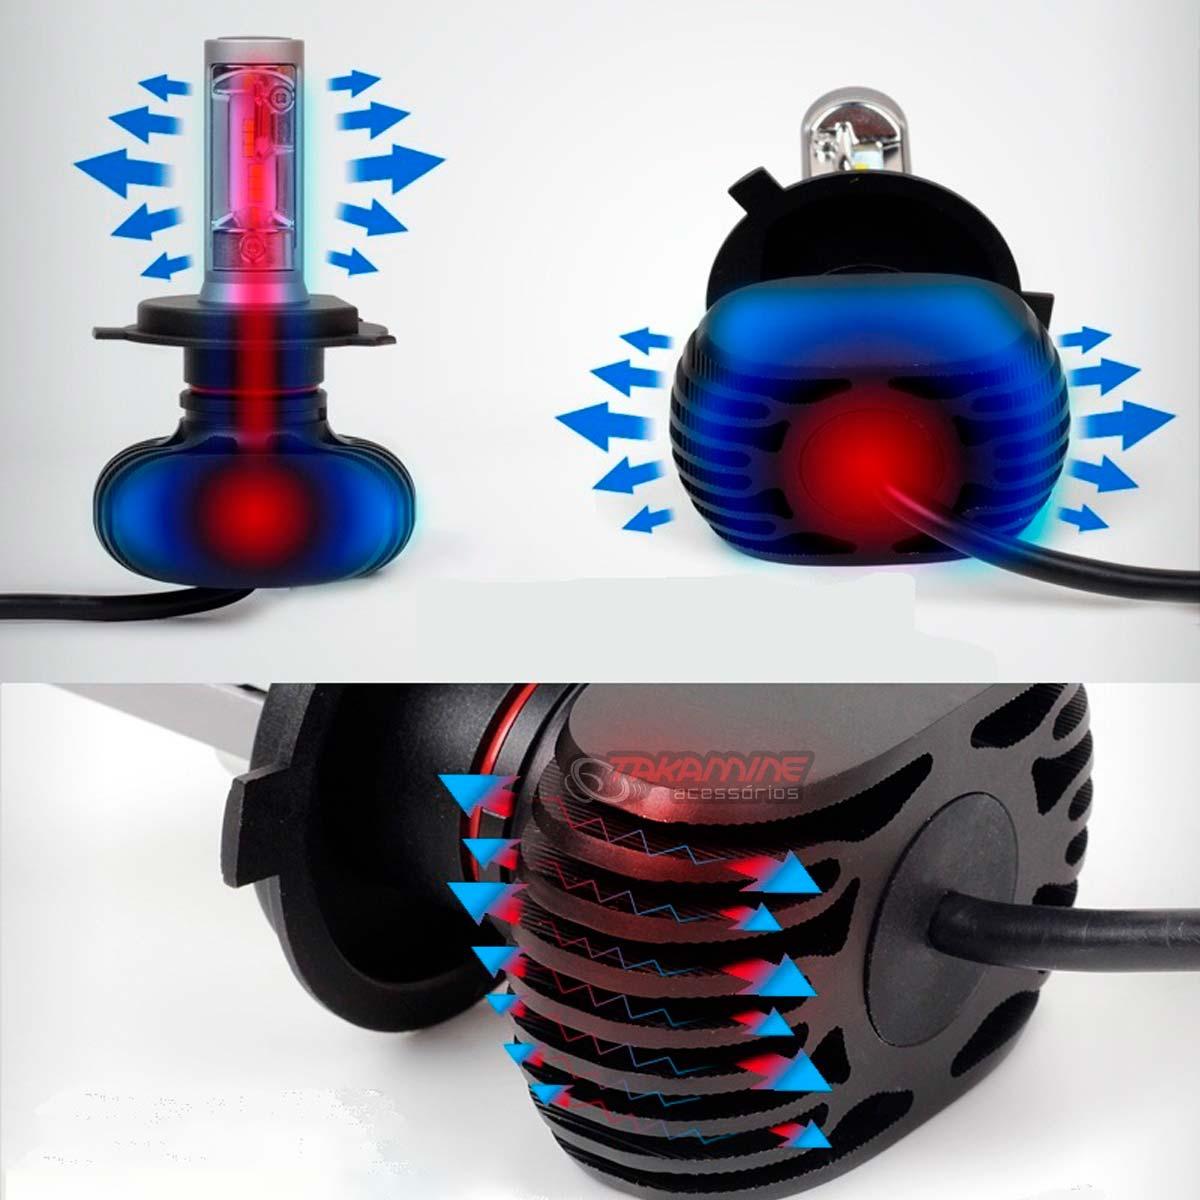 Kit Ultra LED Gol G6 farol duplo 2013 2014 2015 2016 tipo xenon farol baixo H7 50W